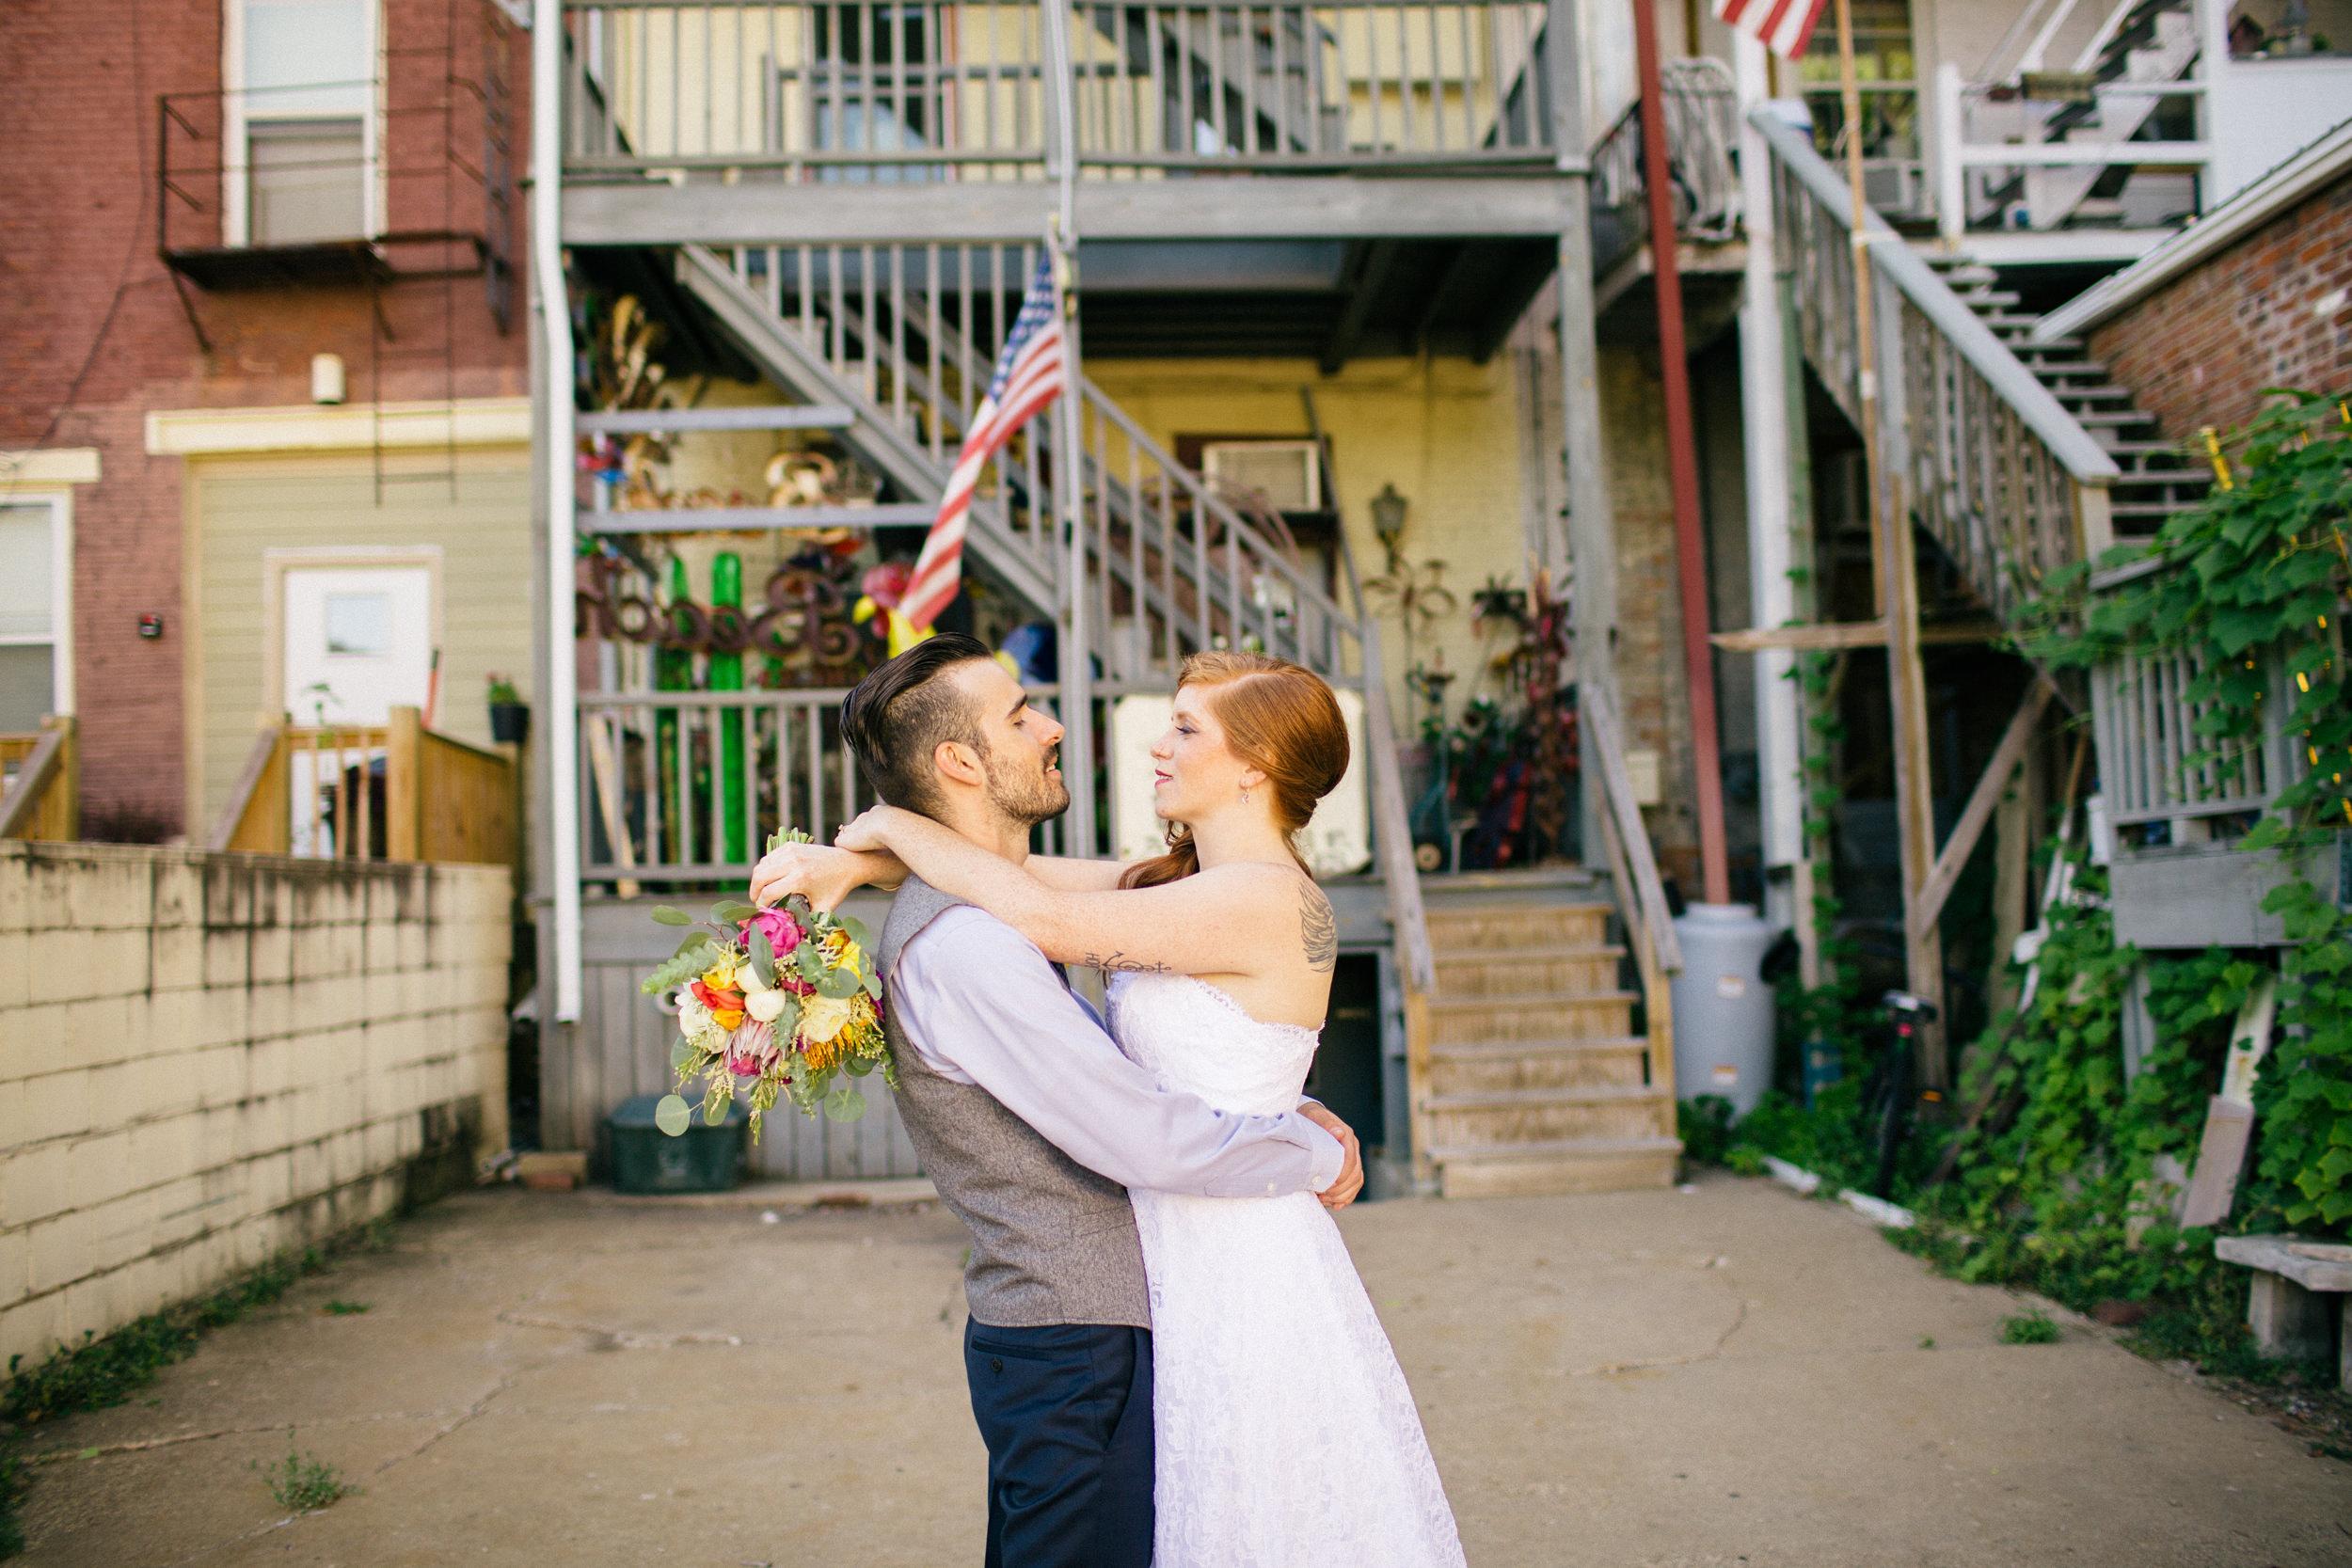 7-25-2015 Sarah and Jimmy's Eagle Ridge Downtown Galena Wedding-170.jpg